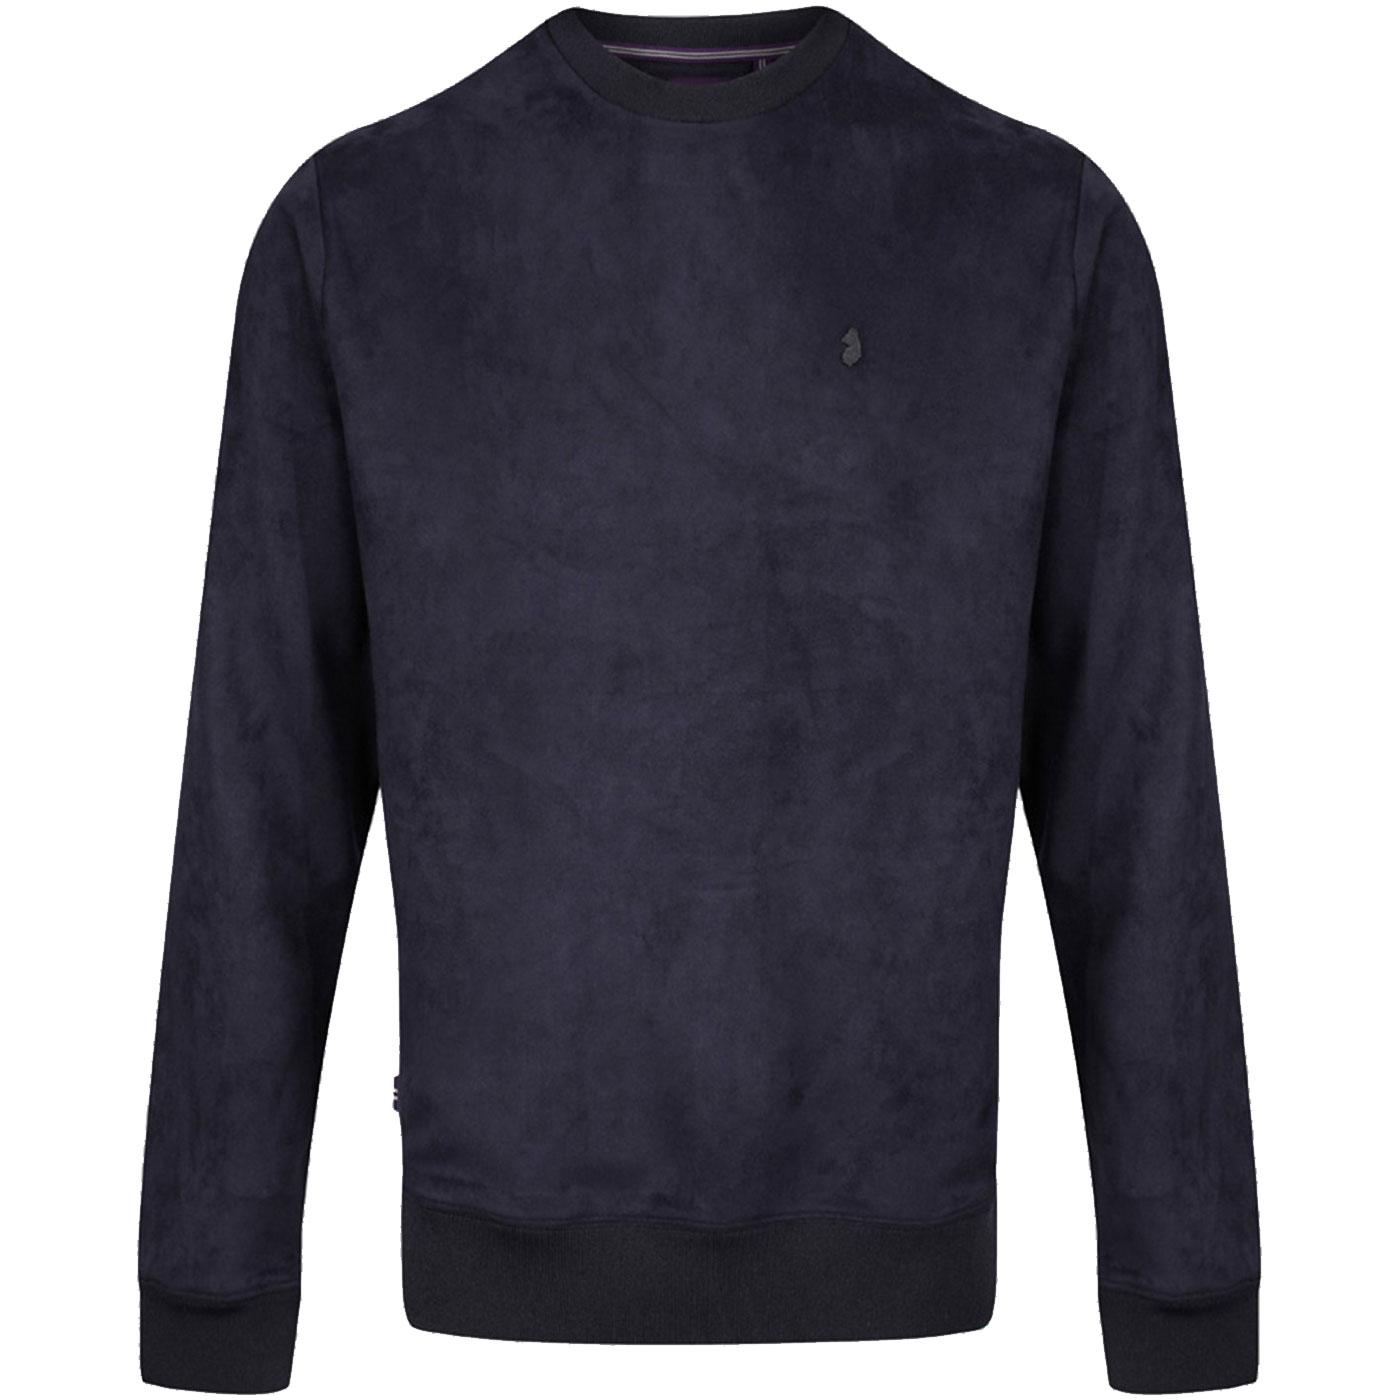 Dennis LUKE Mens Retro Faux Suede Sweatshirt VDN